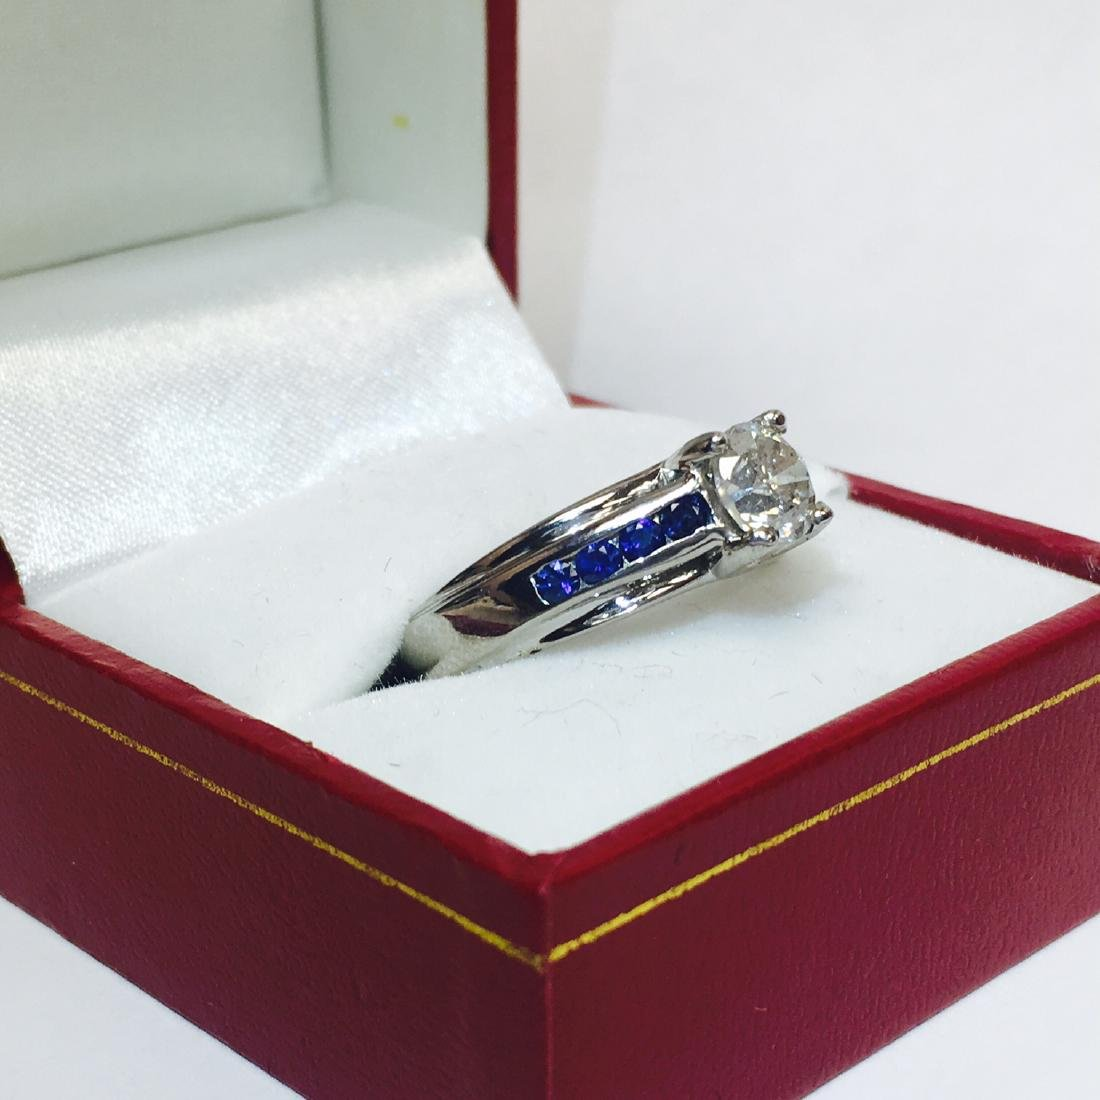 18K, 1.70 Carat Diamond and Blue Sapphire Ring - 2